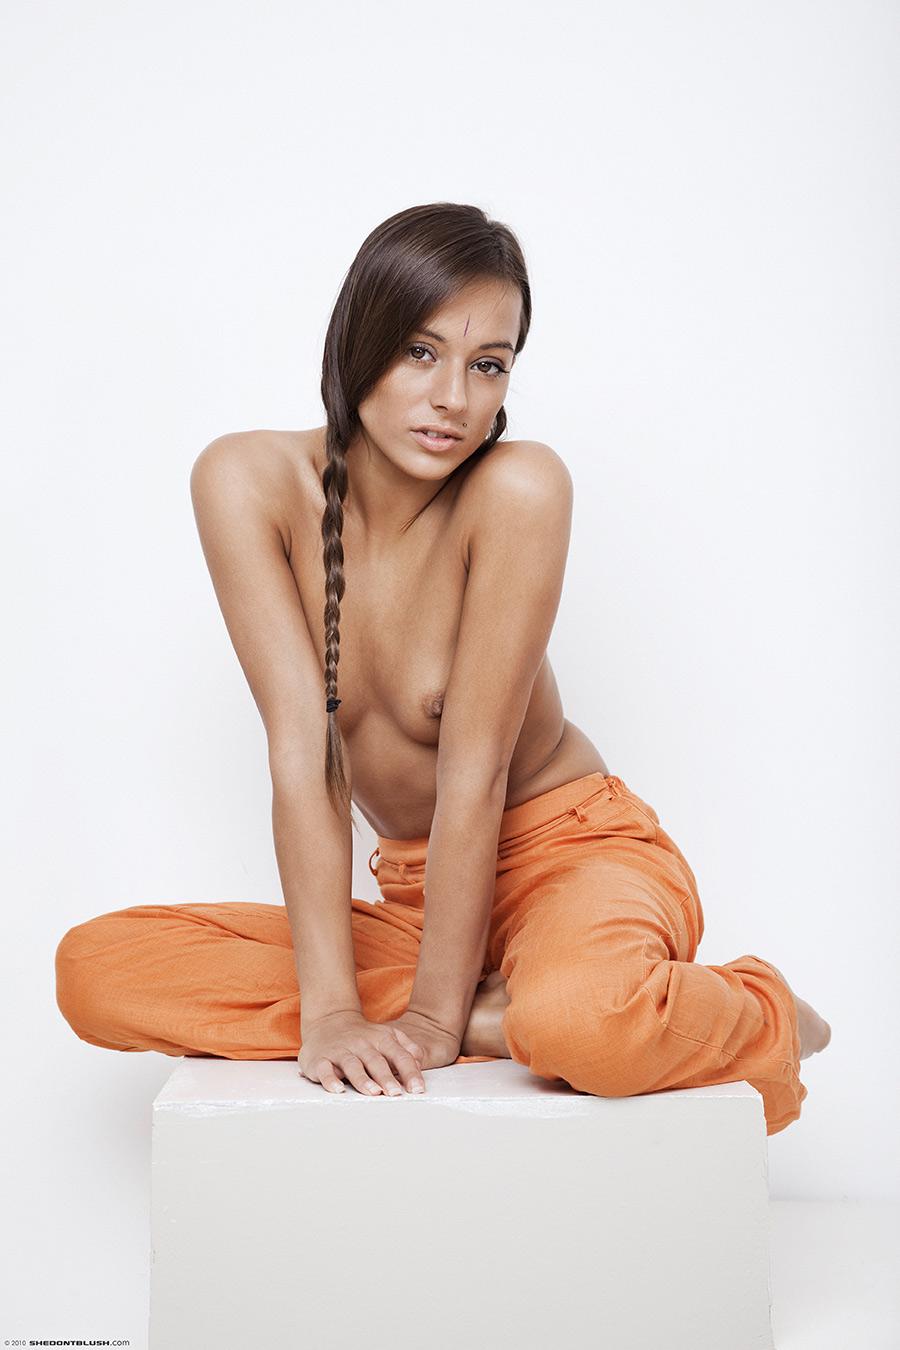 Nude Art Indian